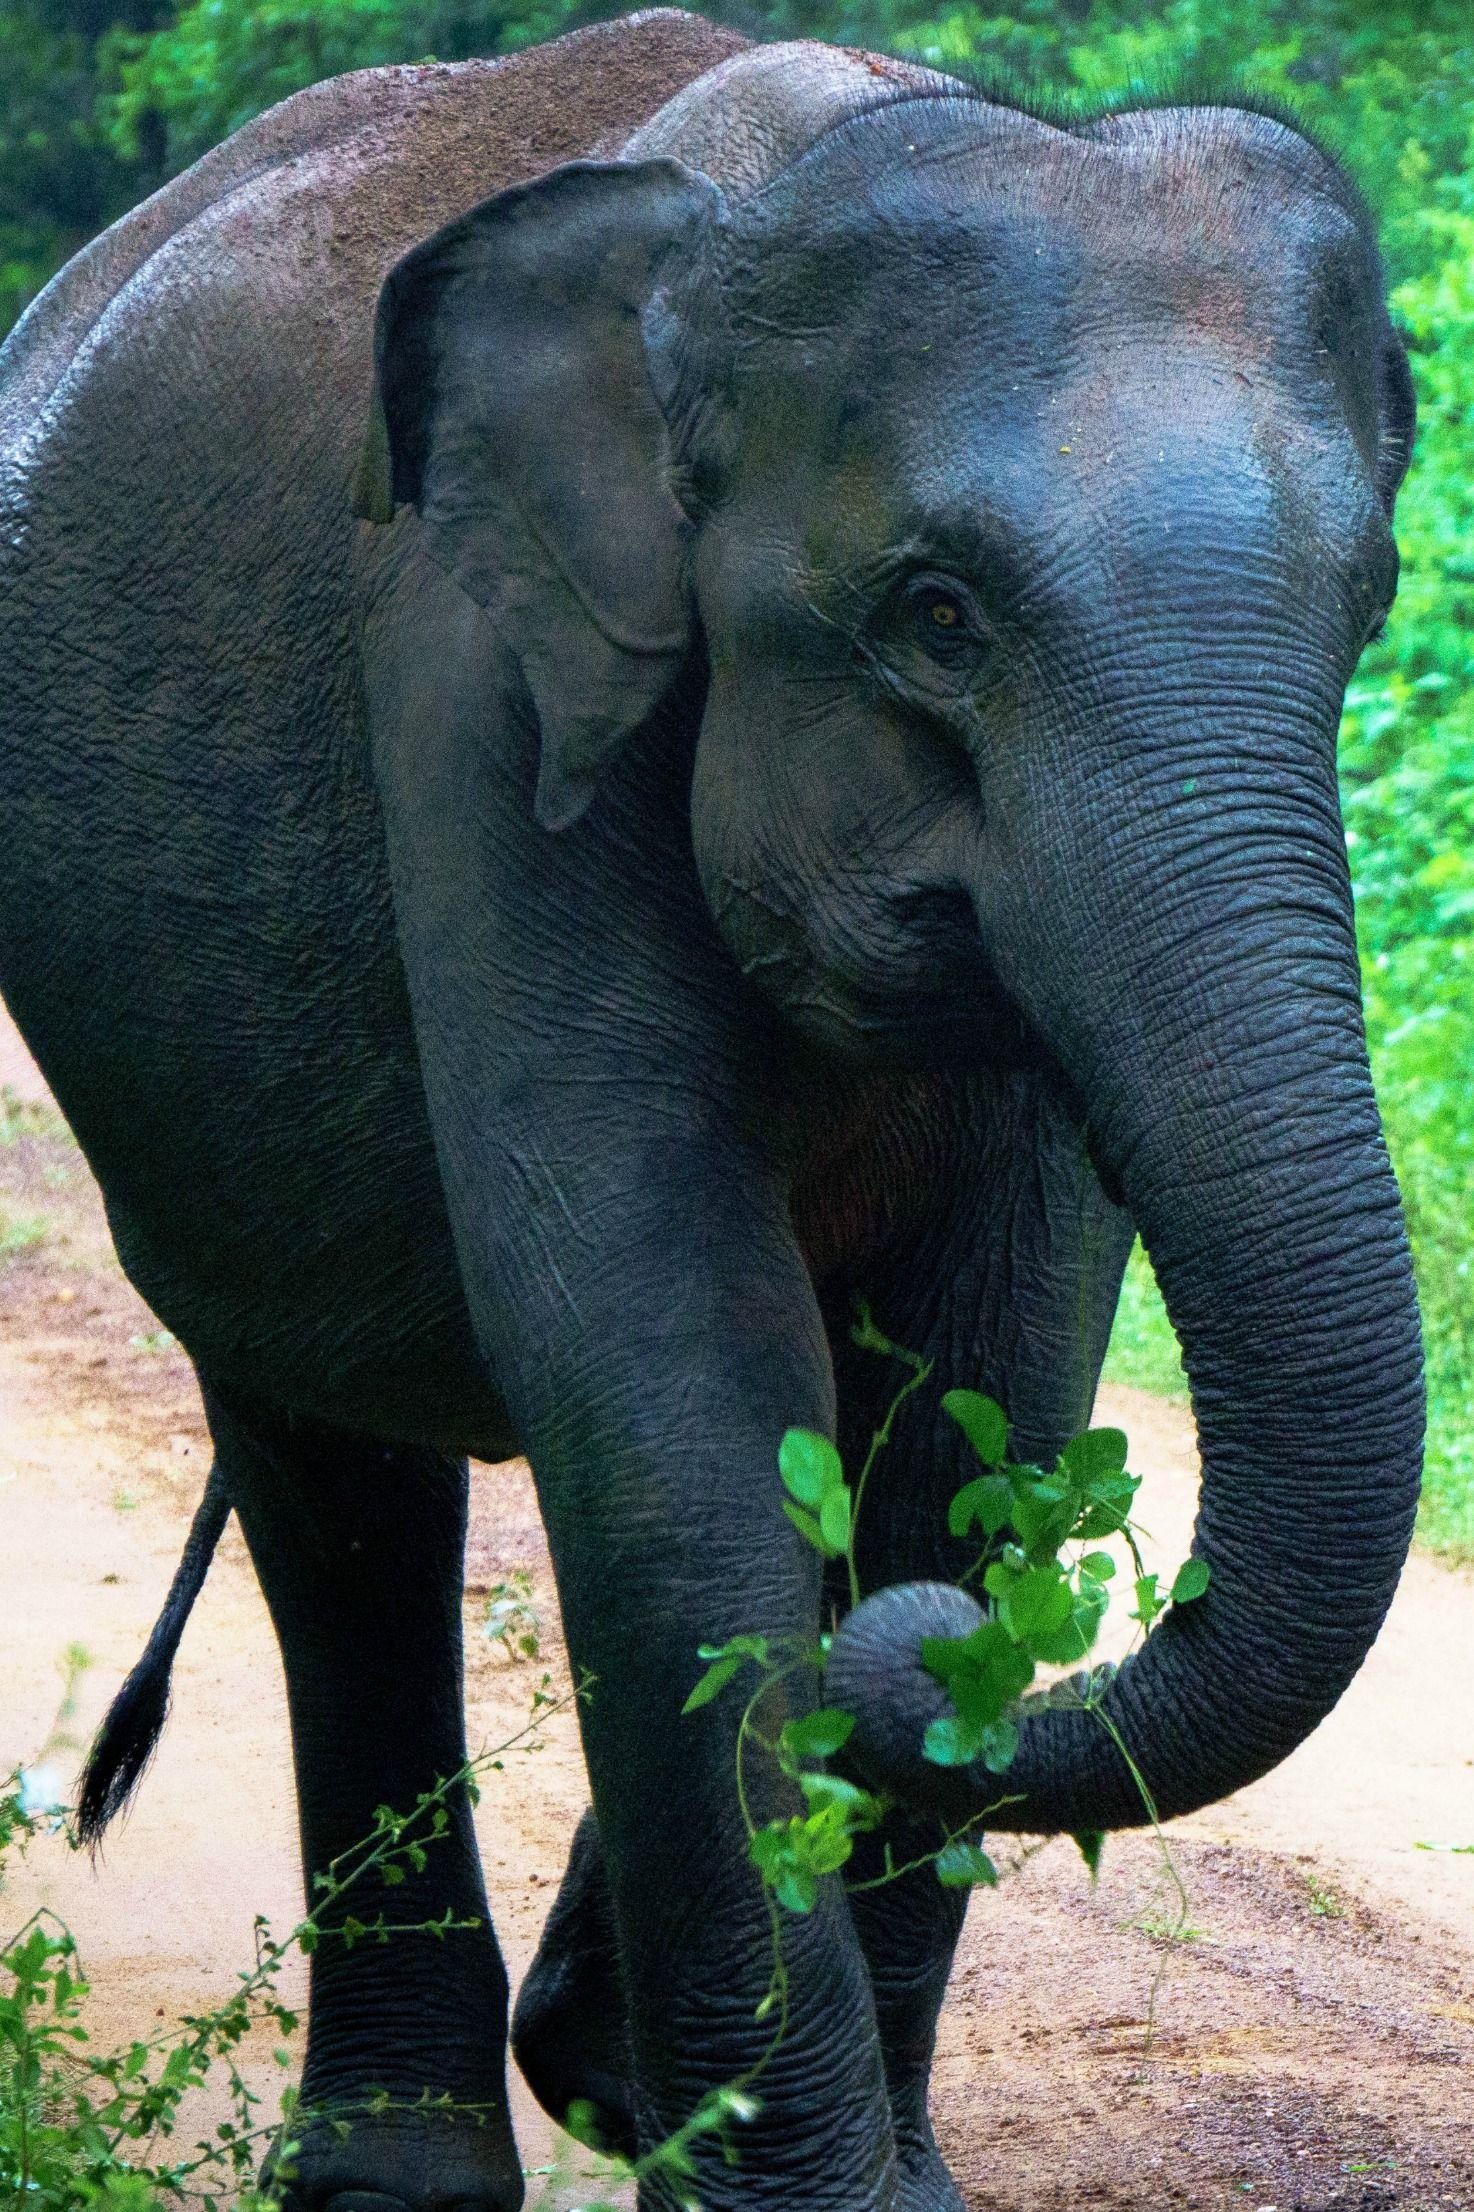 On Safari at Yala National Park, Sri Lanka